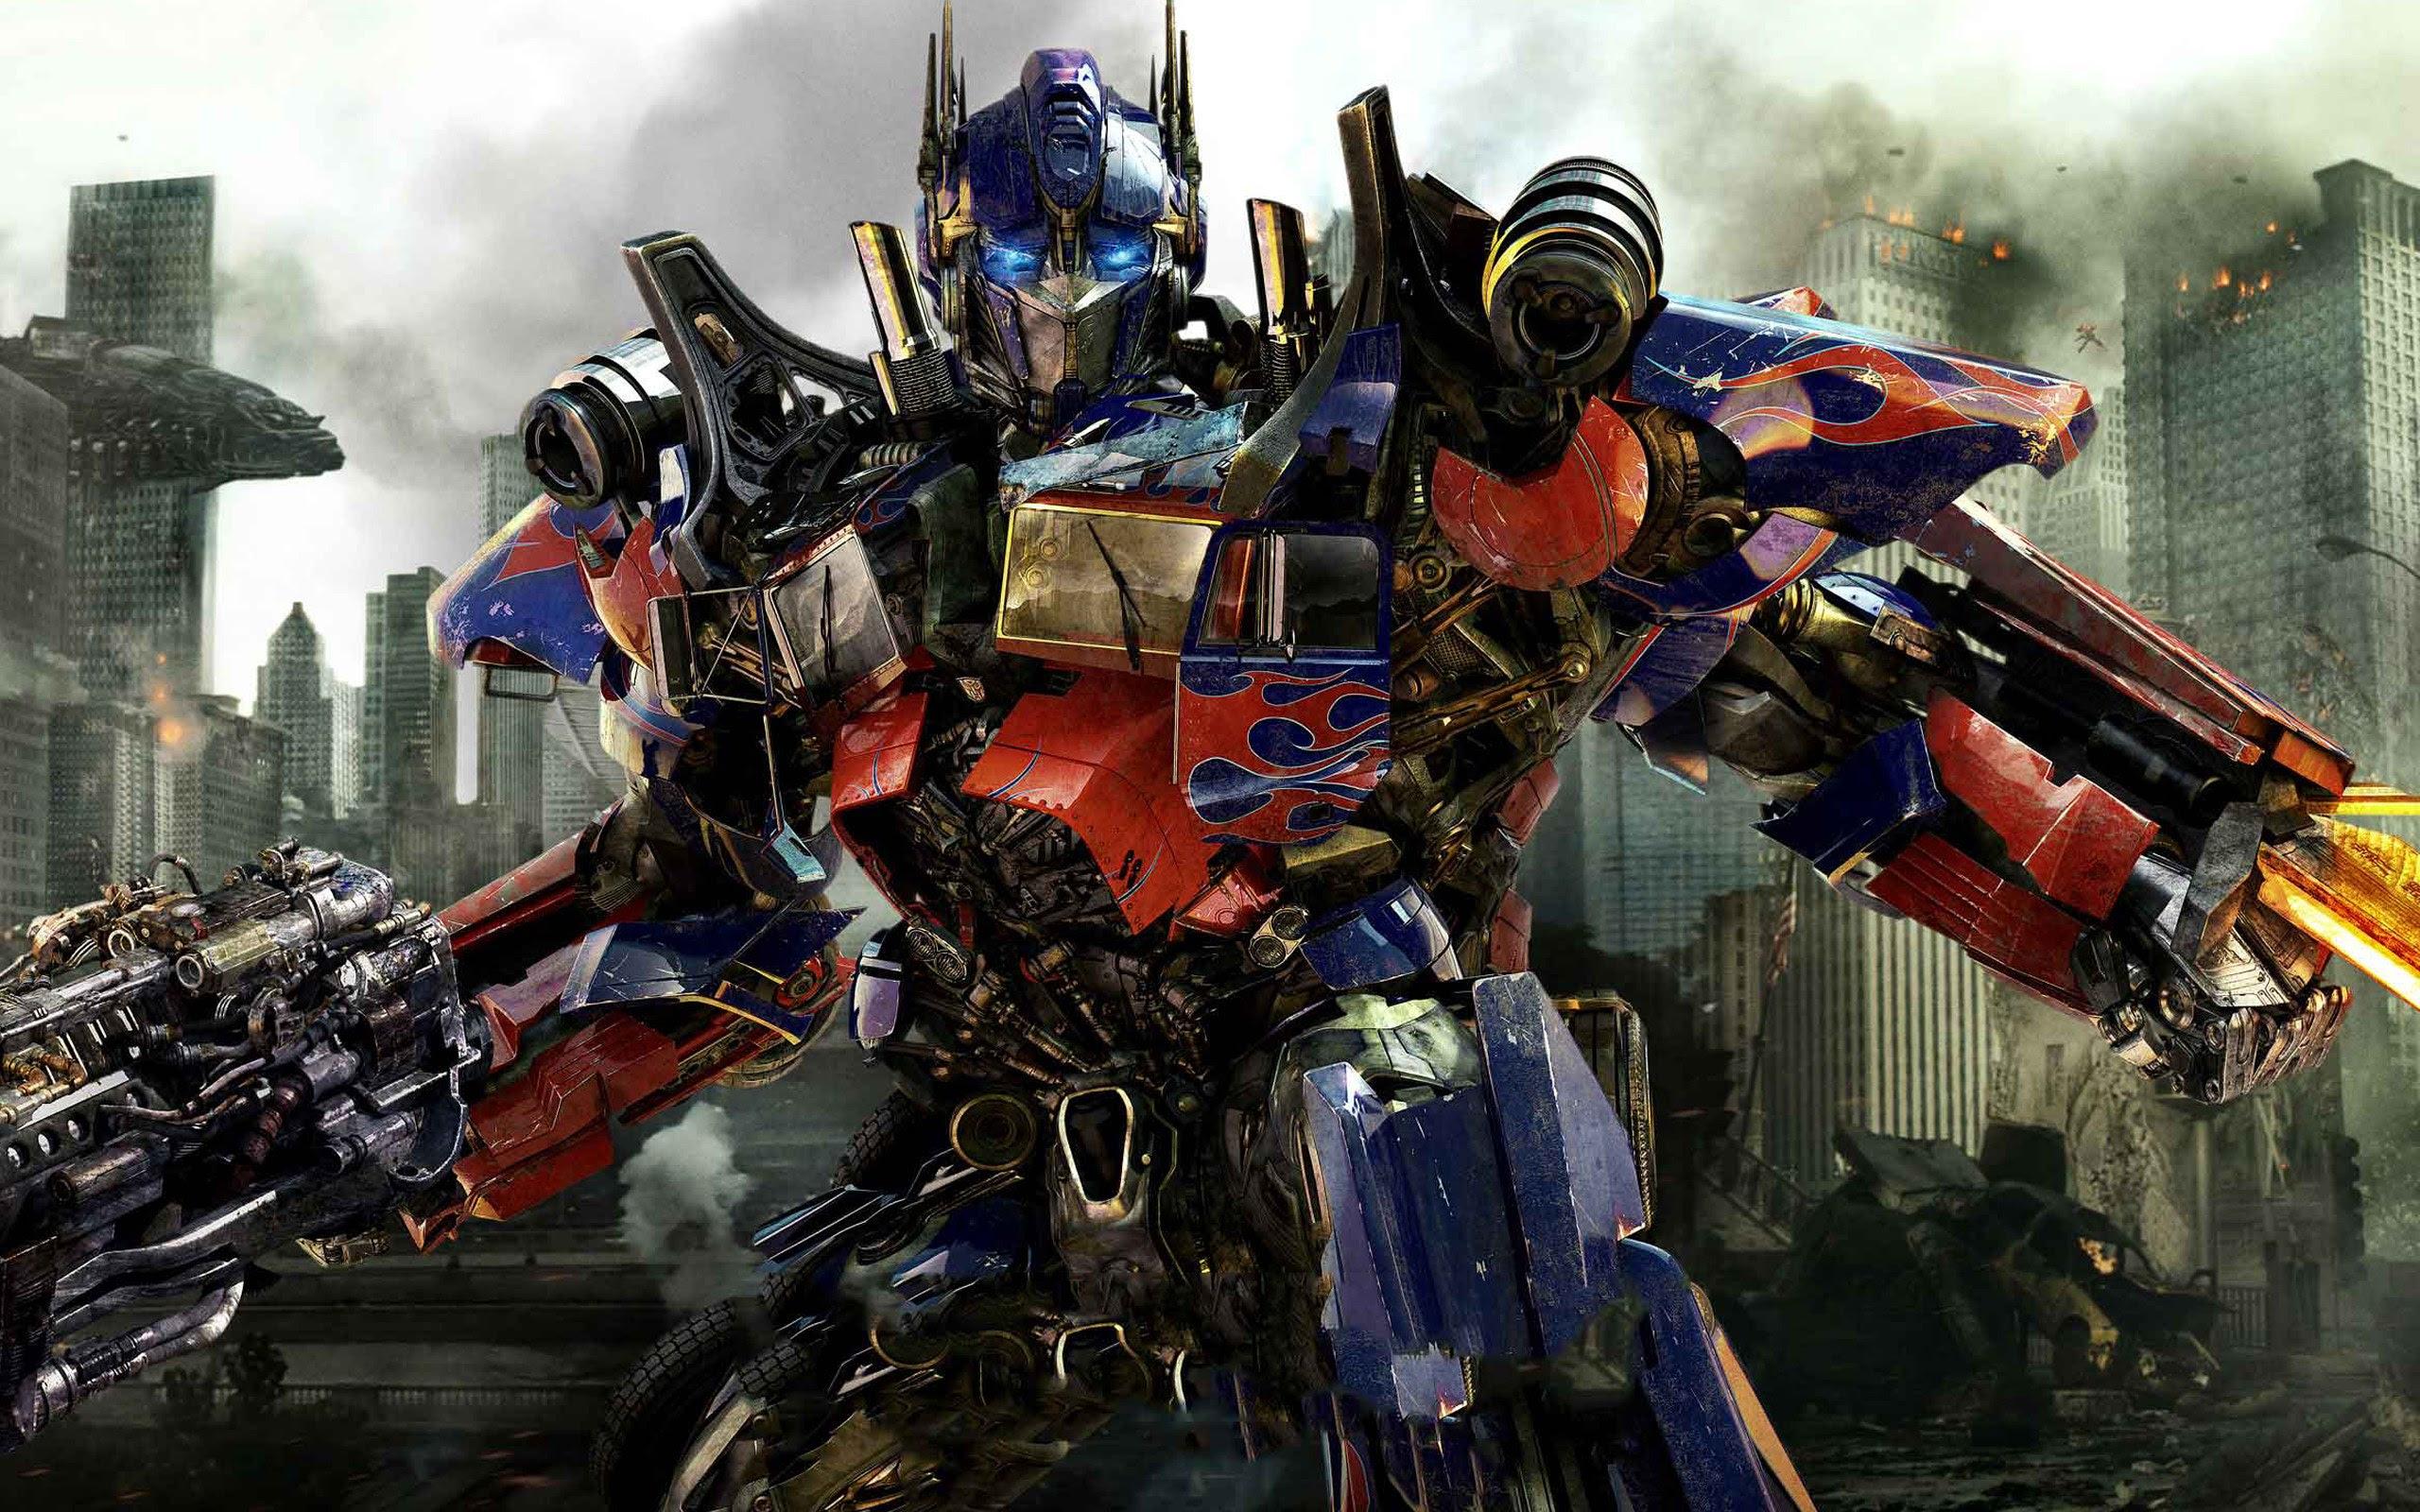 http://www.hdwallpapers.in/walls/optimus_prime_in_new_transformers_3-wide.jpg